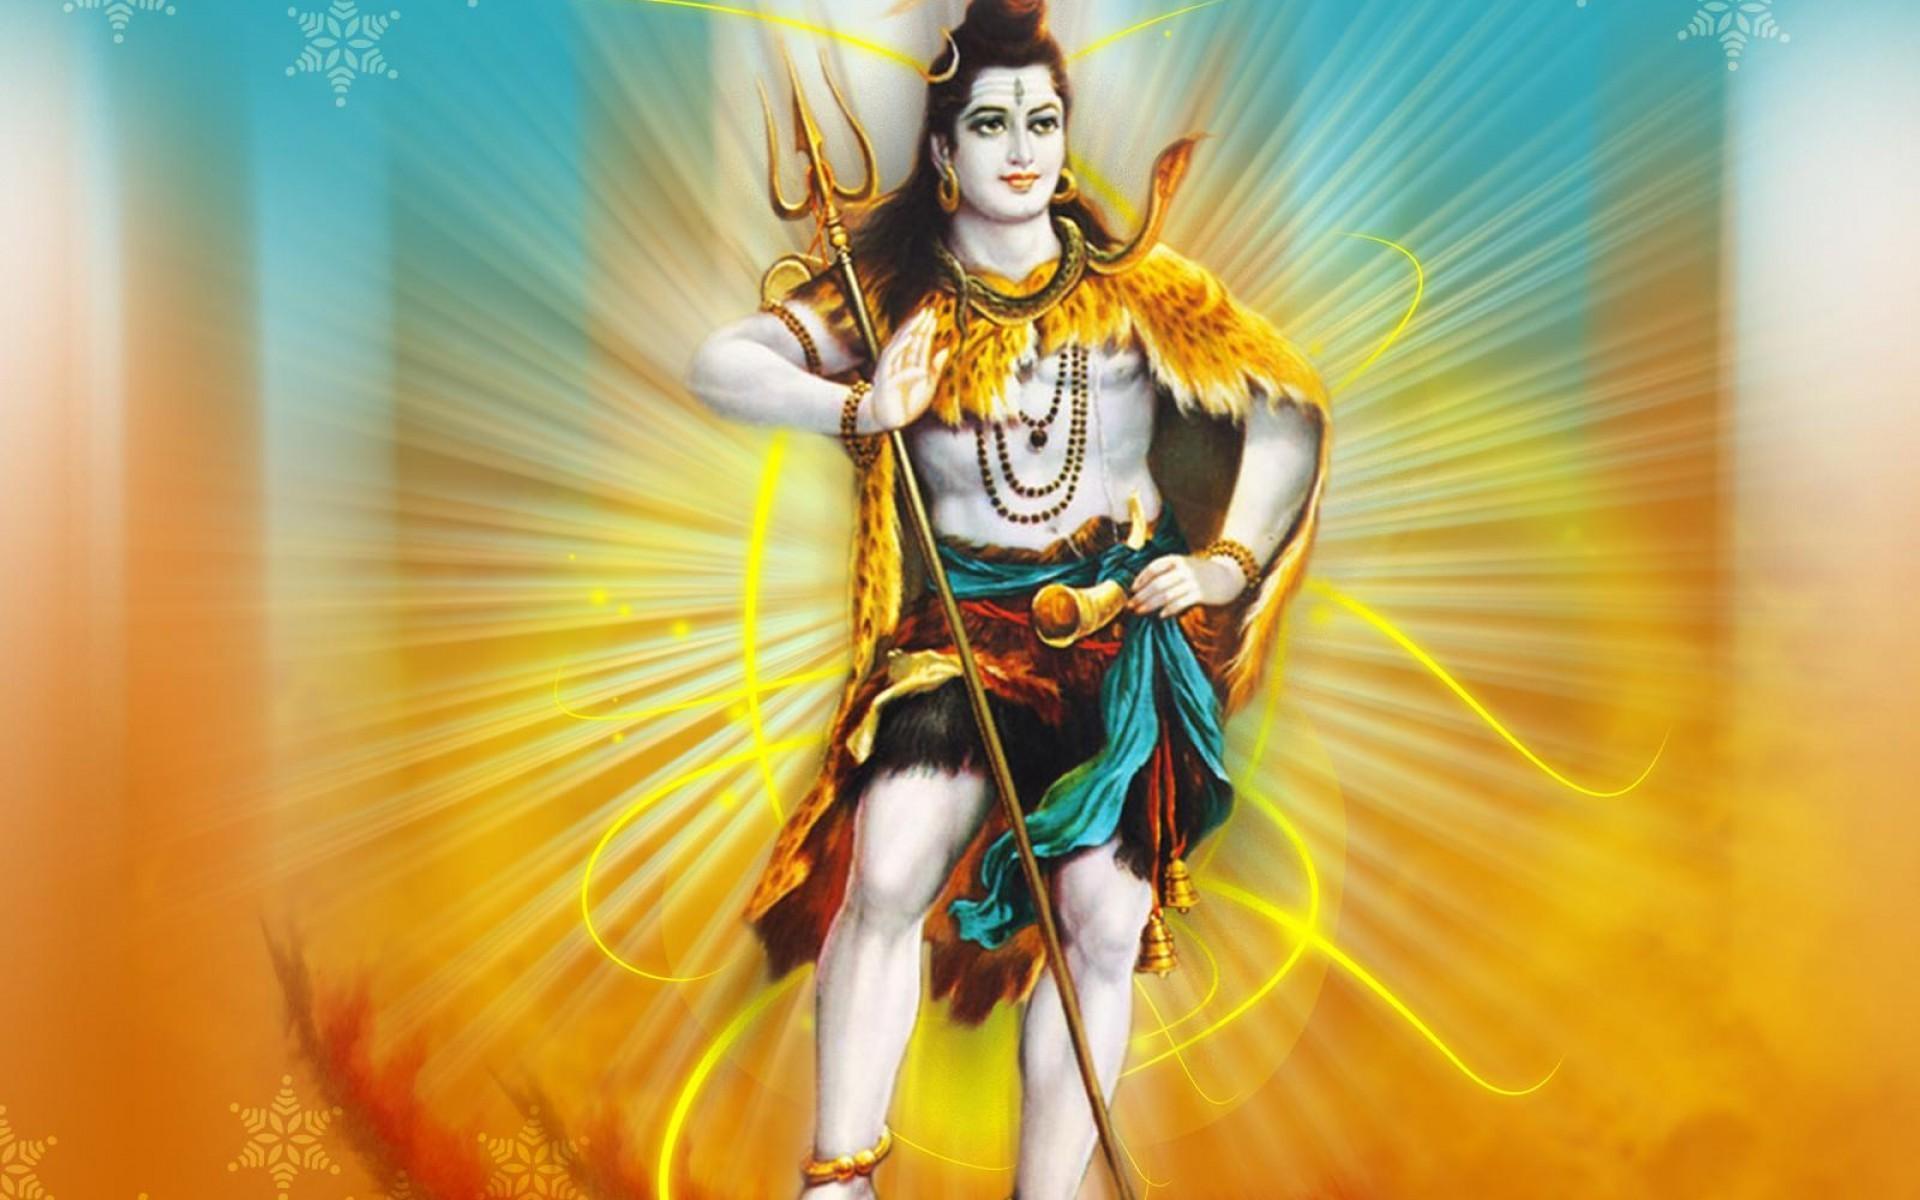 Desktop HD Lord Shiva Wallpapers - Wallpaper Cave